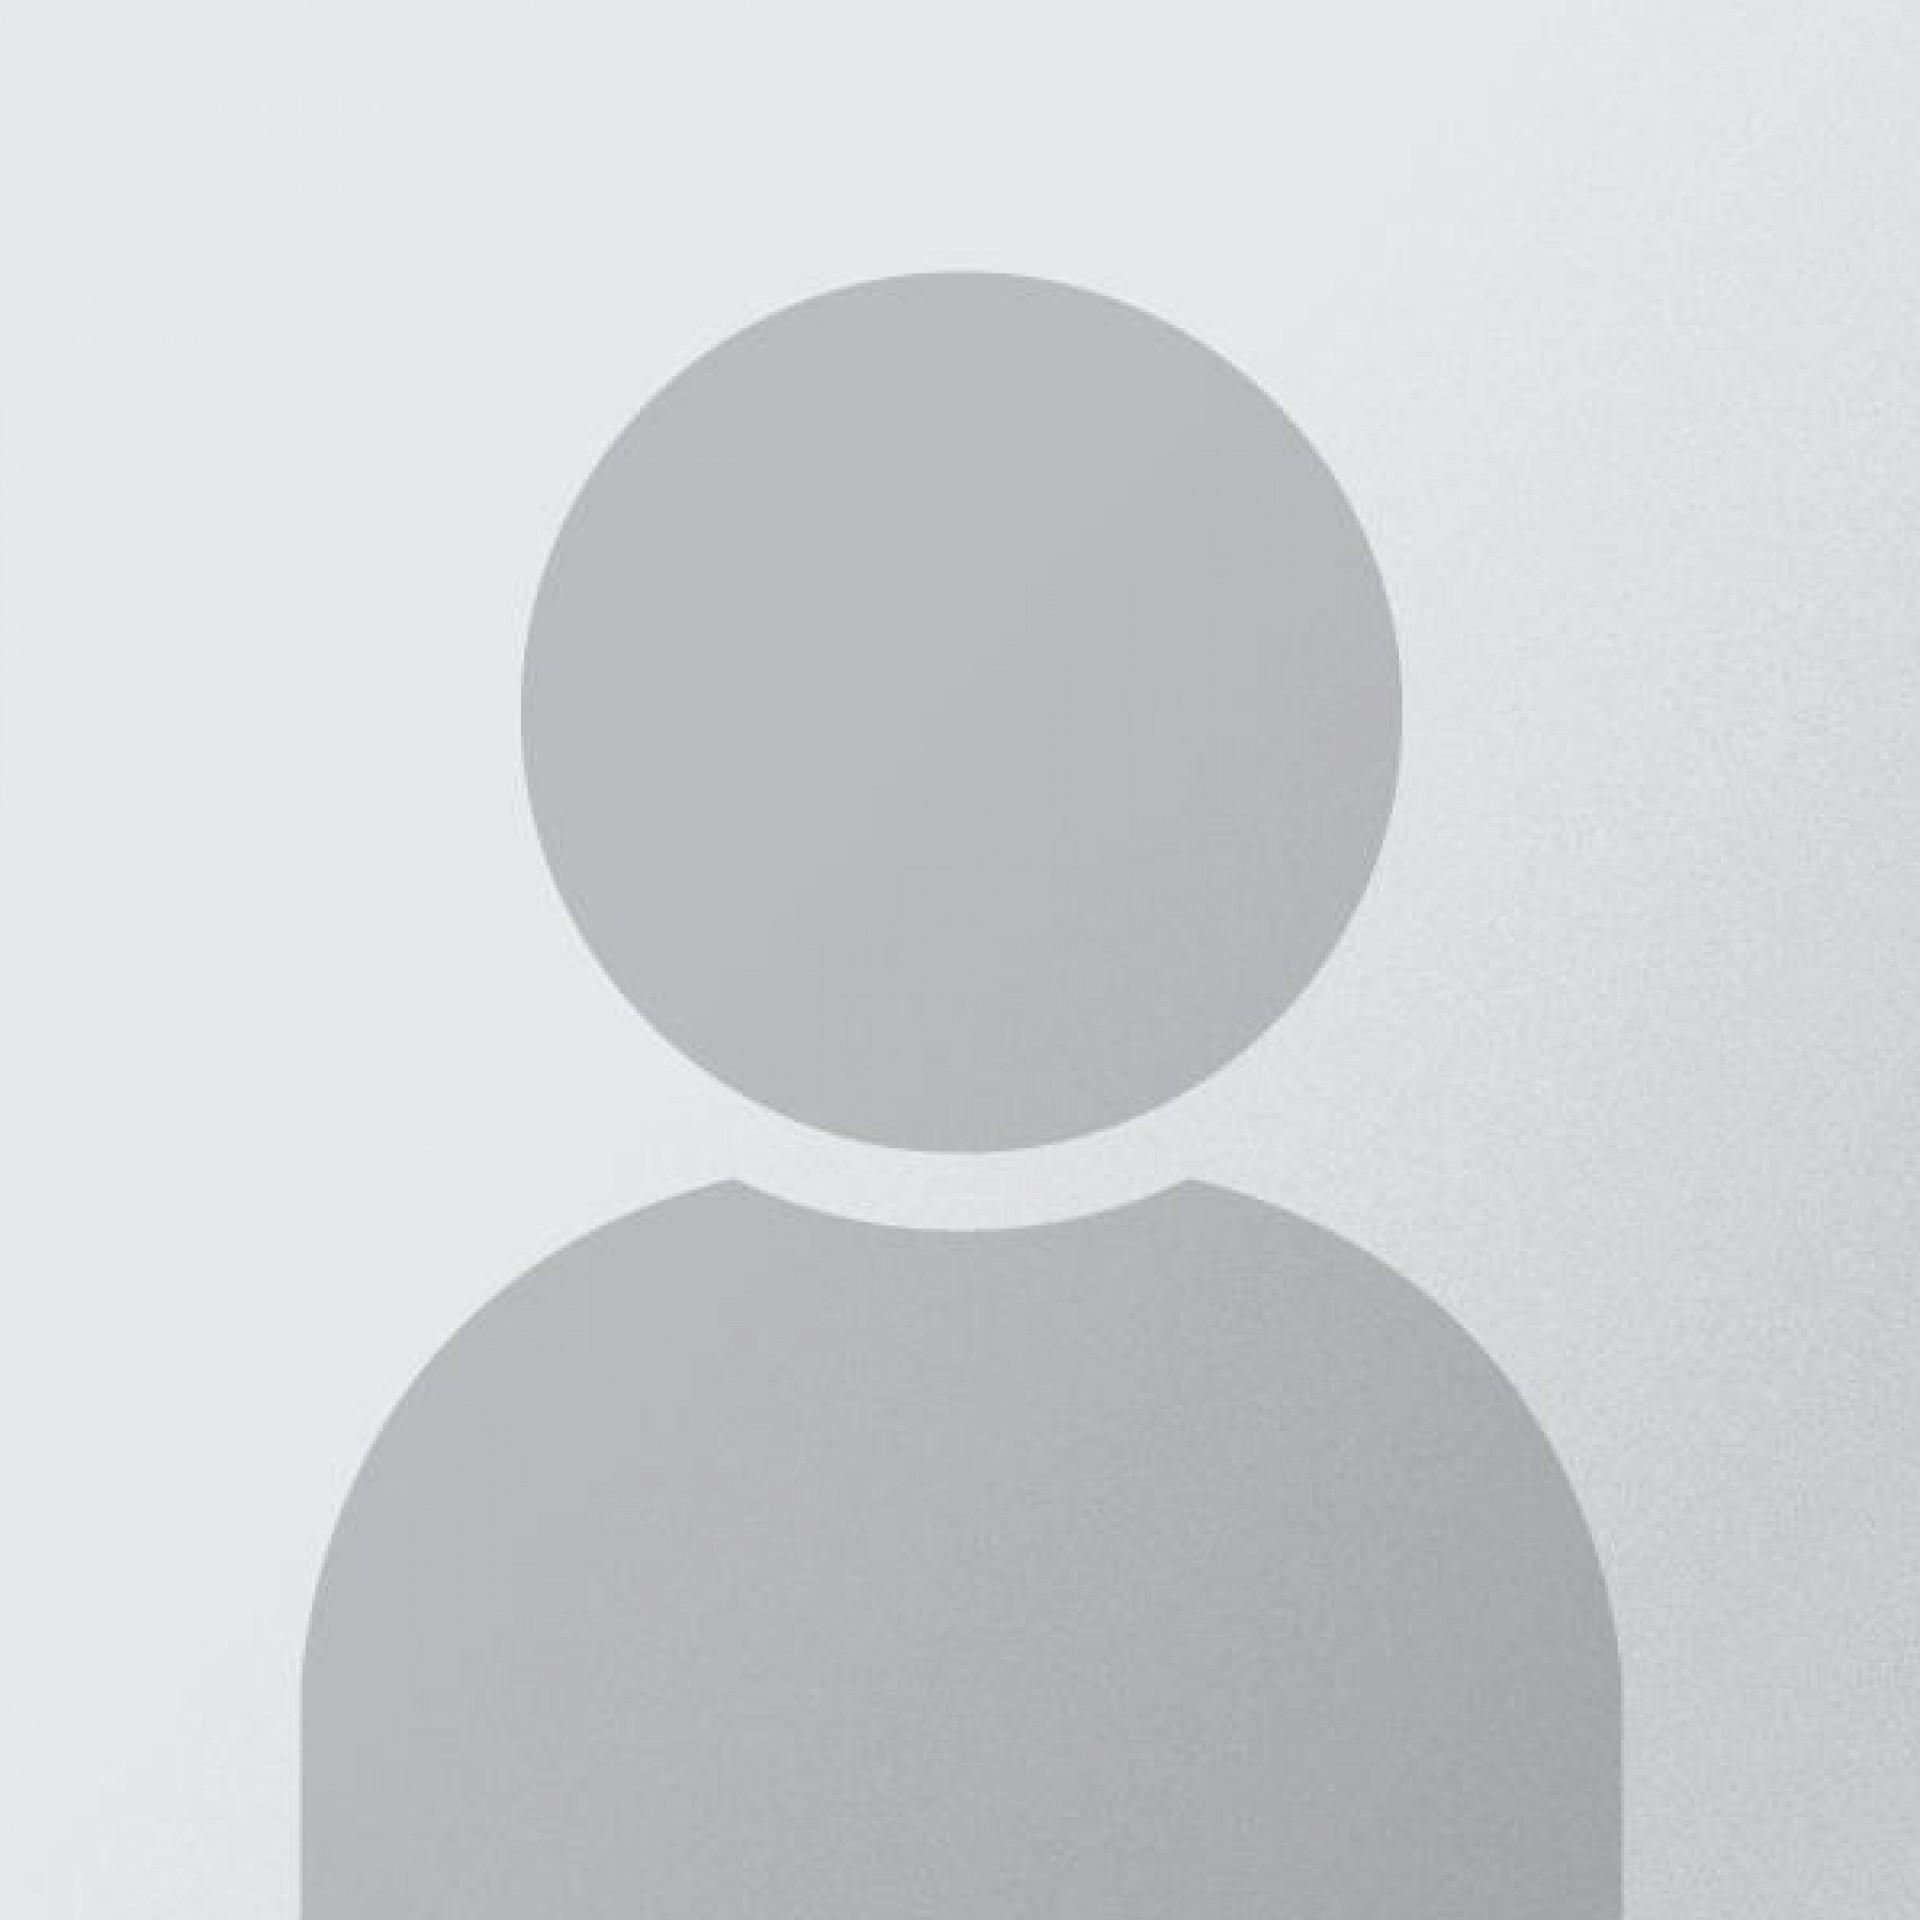 fotografia p021 profilu 01029160HA